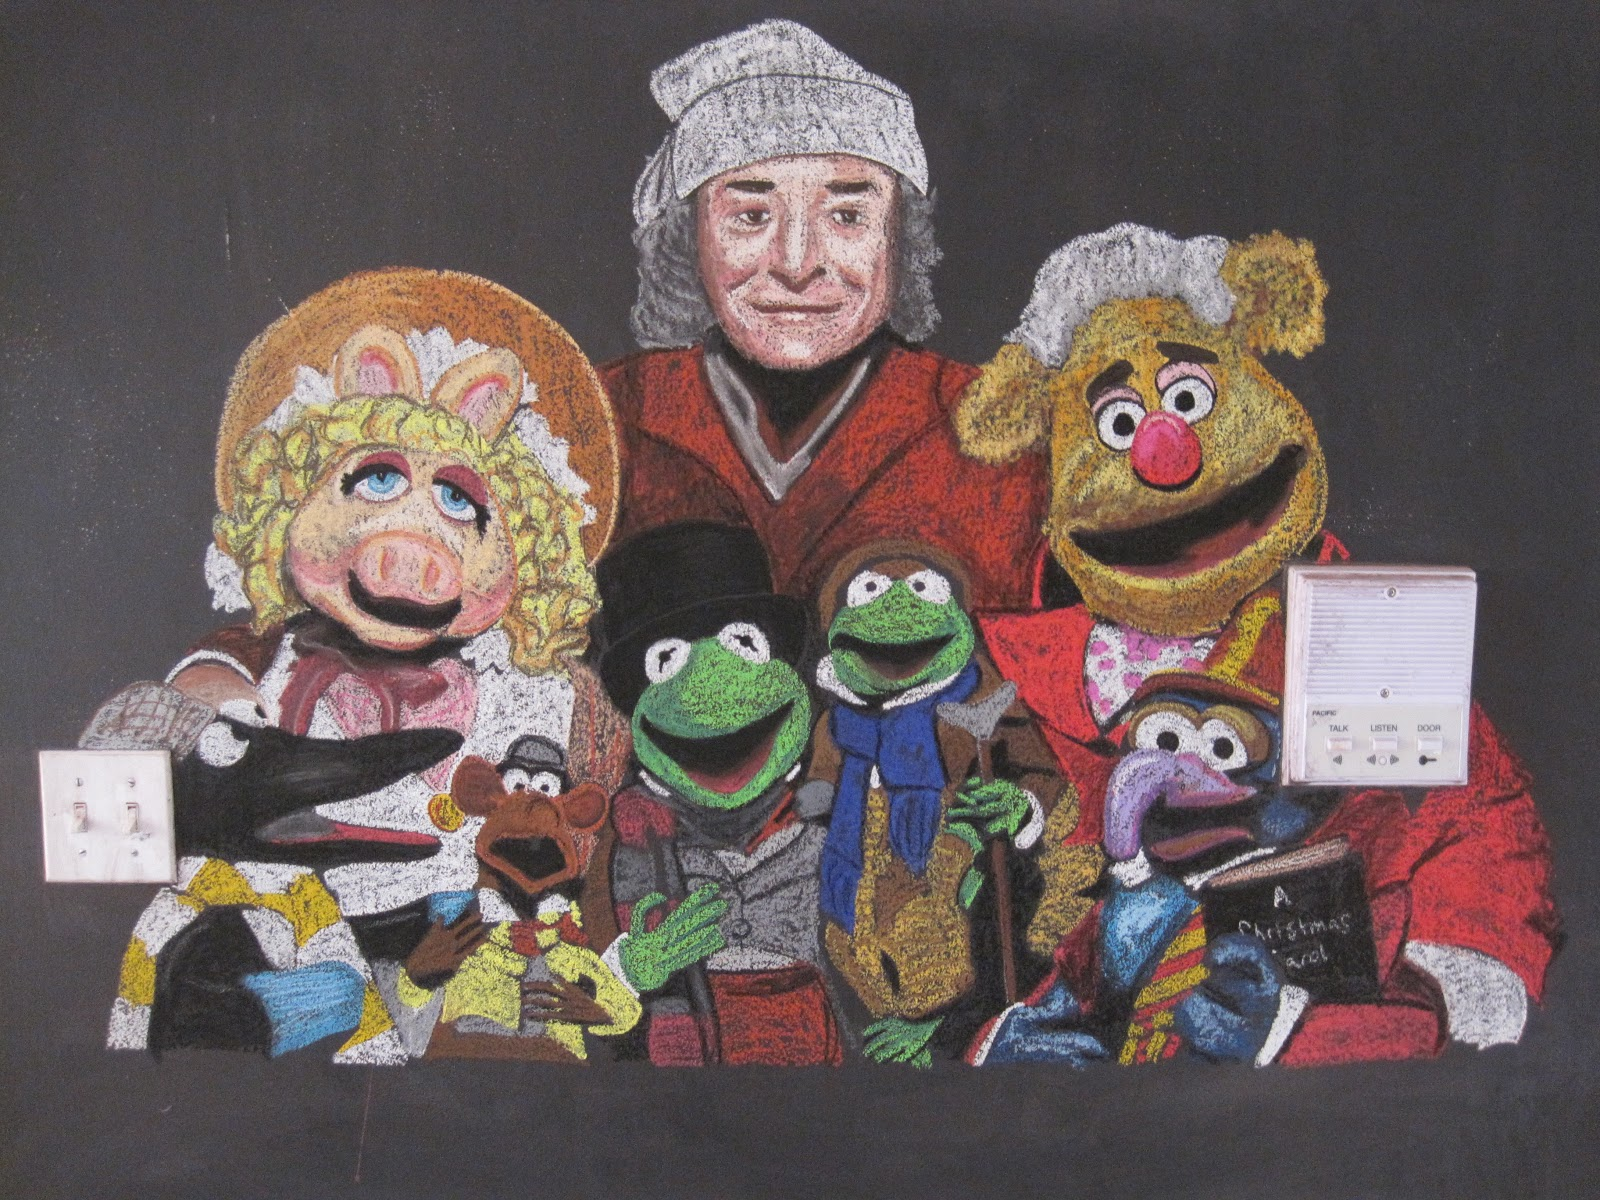 It's a Chalkboard Muralcle!: A Muppet Christmas Carol